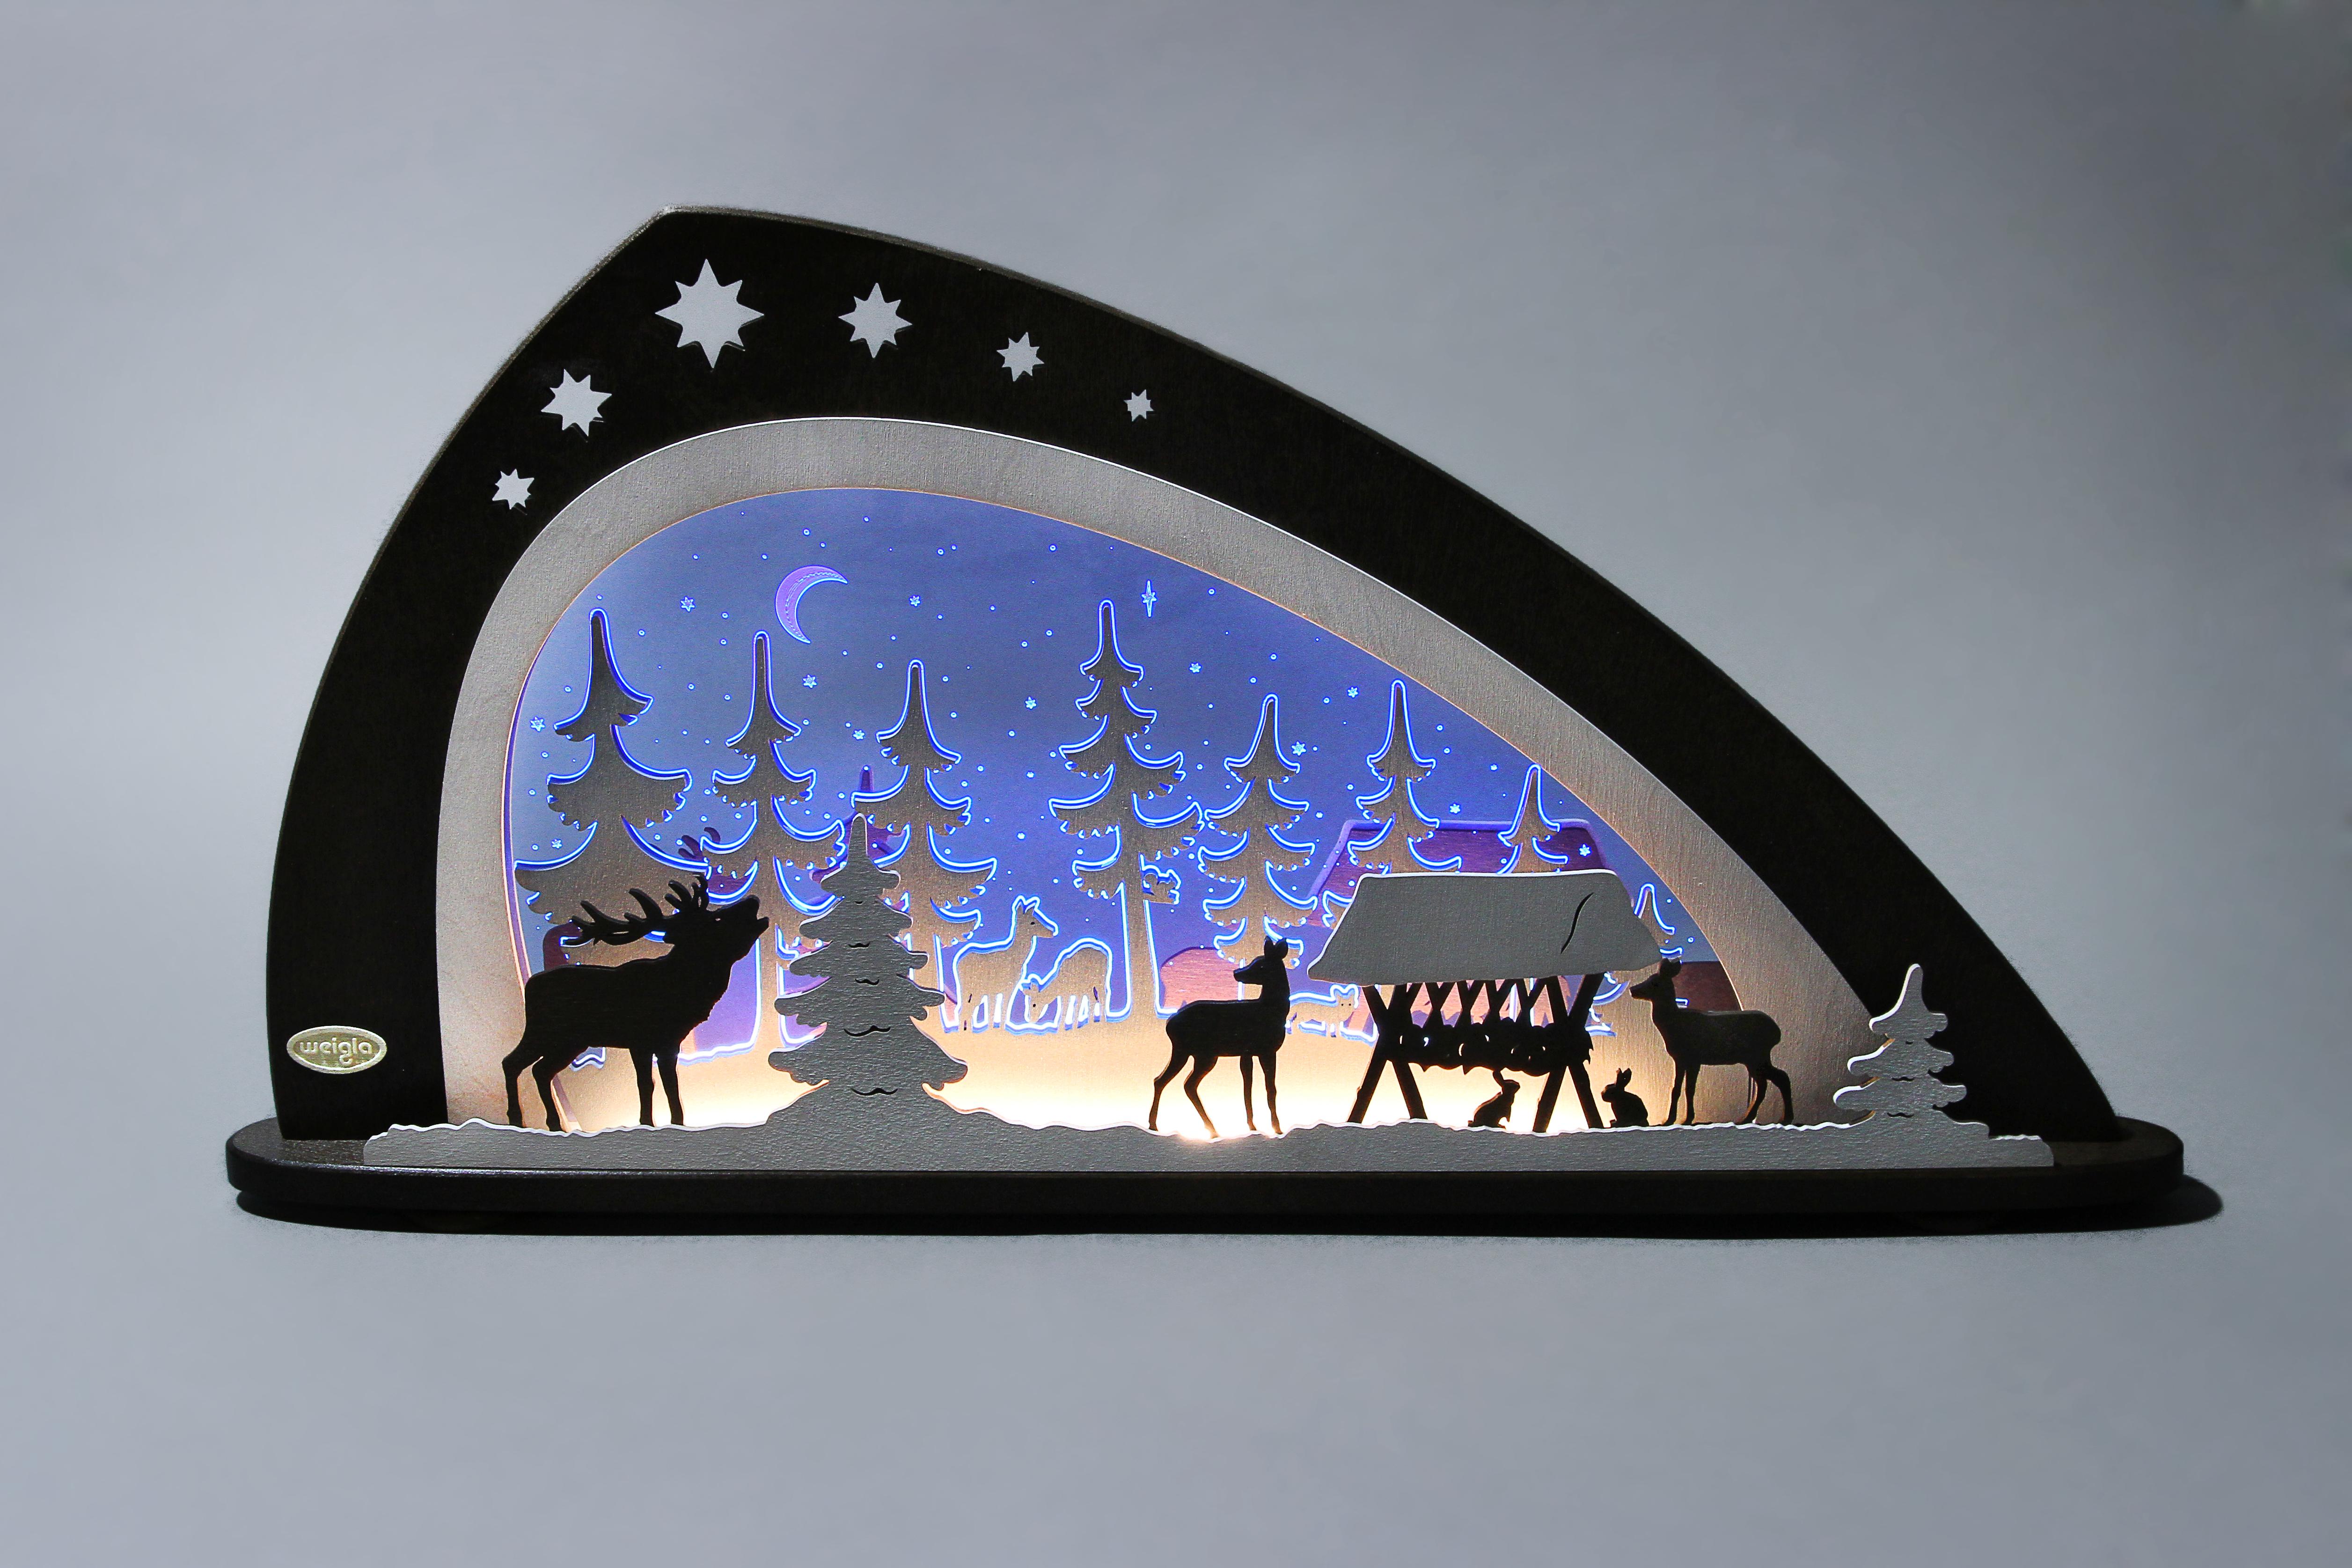 LED Schwibbogen Lights Arch Window Bank schwibbogenbank with Adapter